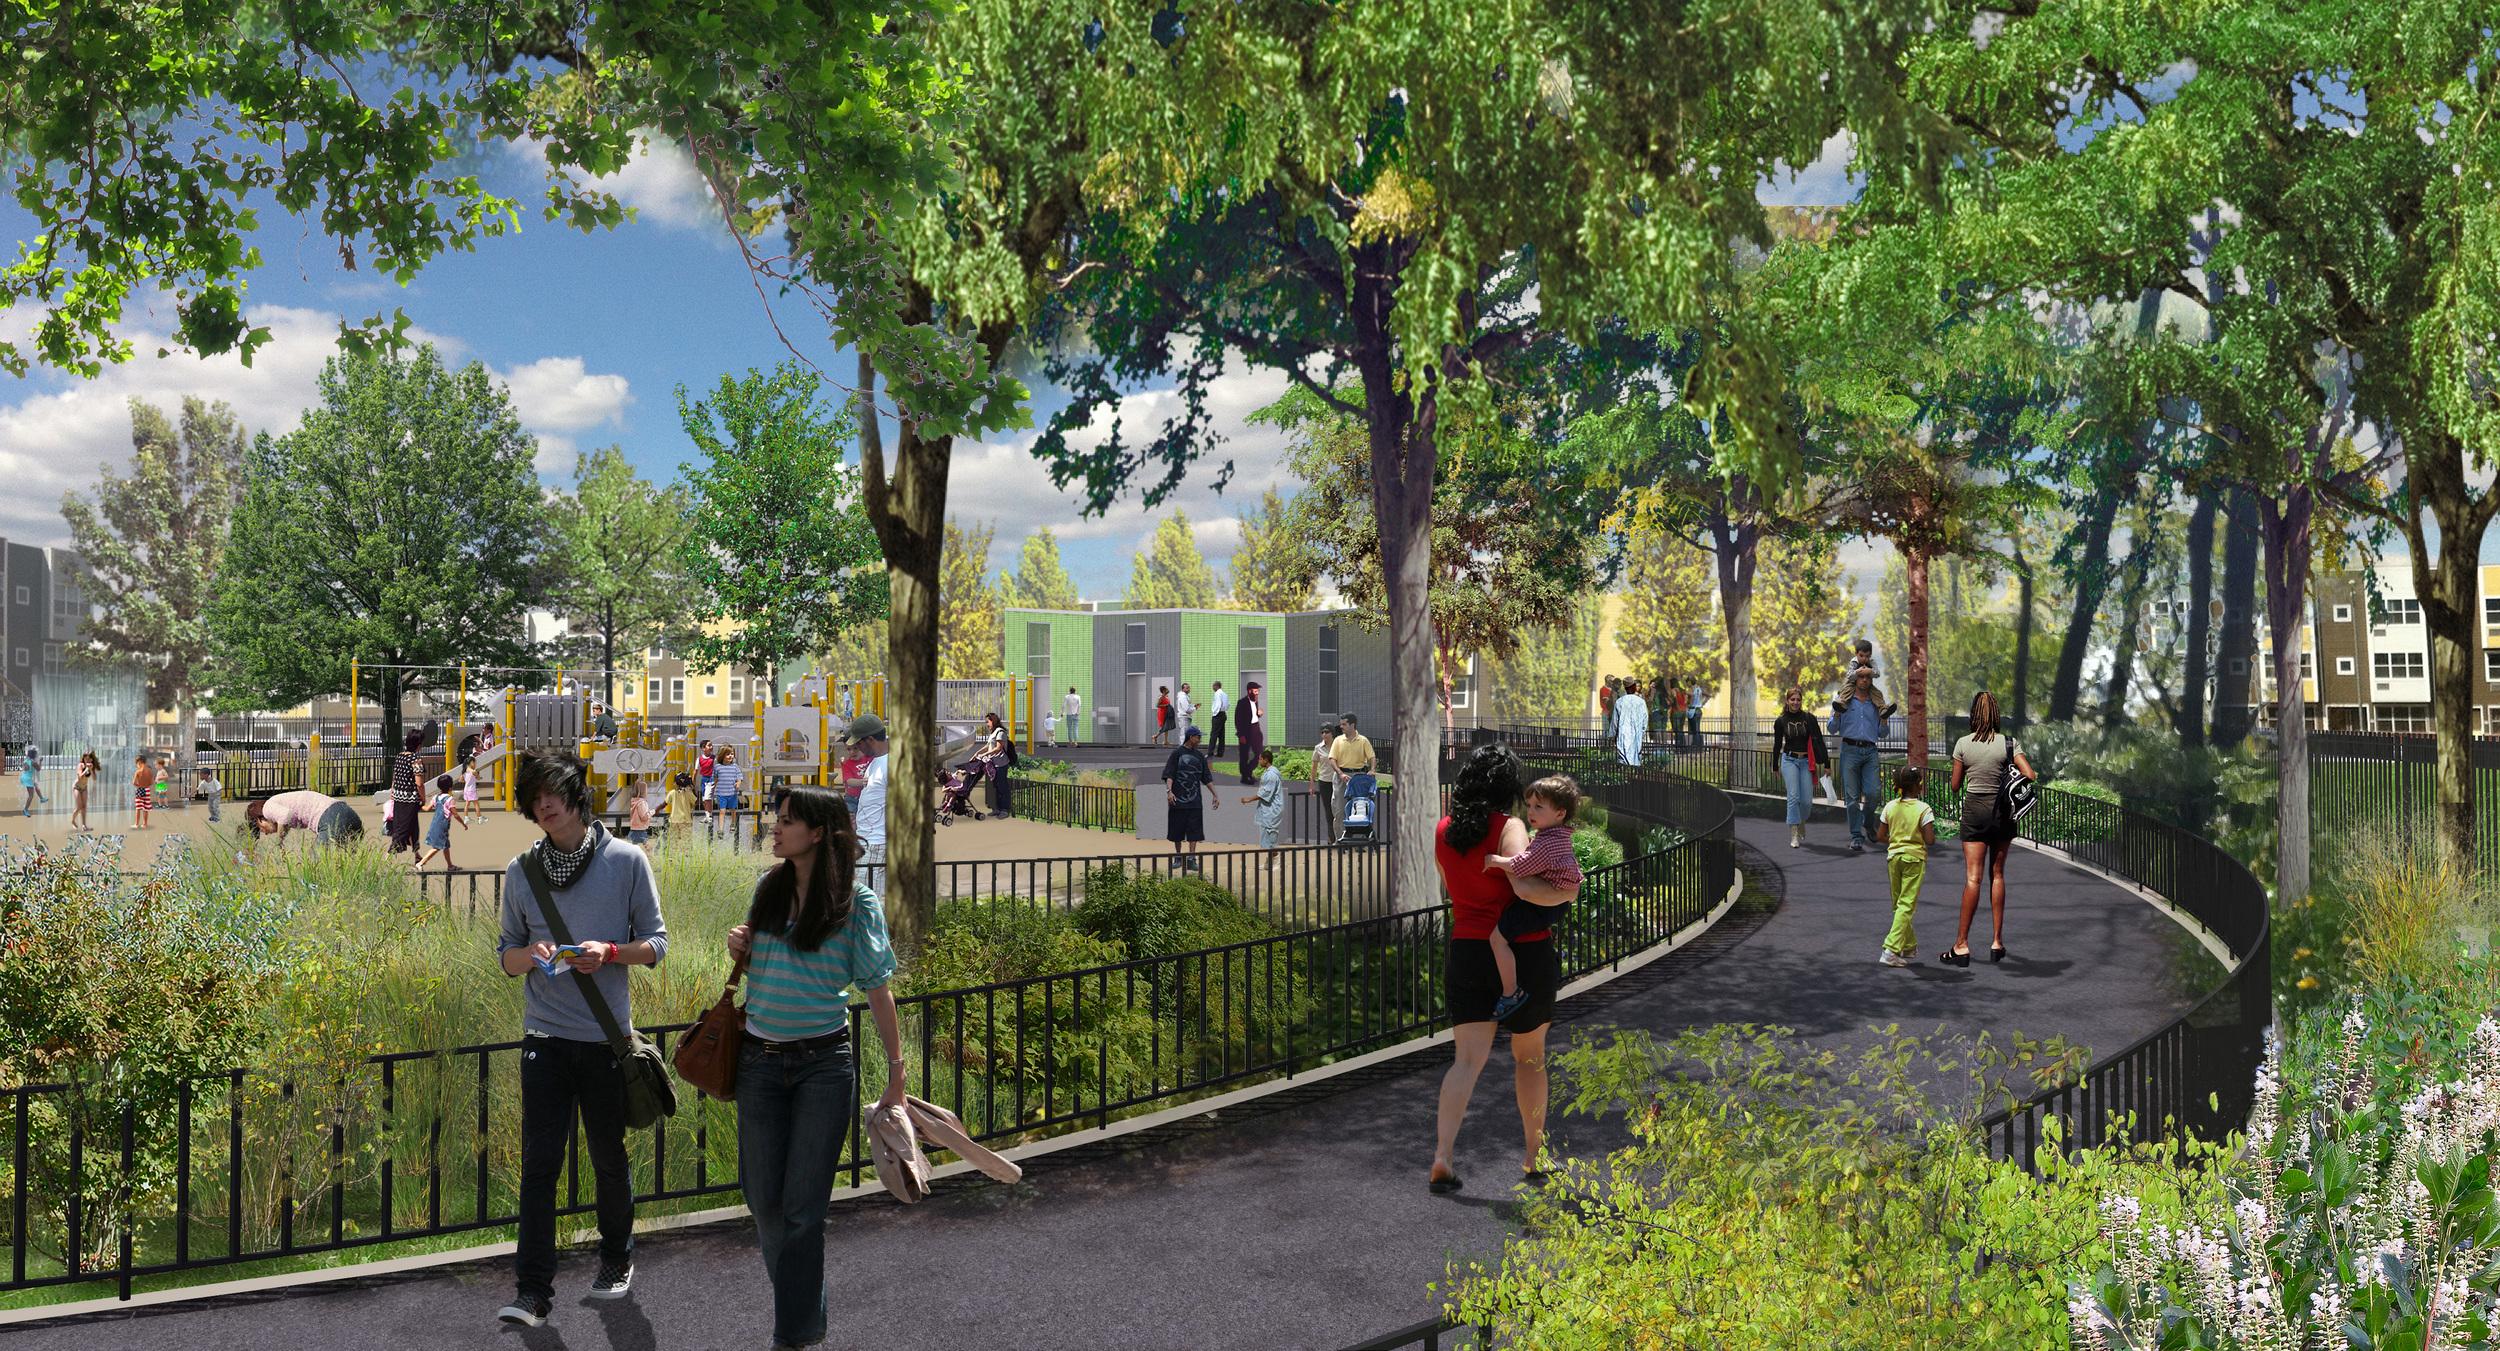 Gateway Estate / Berriman Park Comfort Station